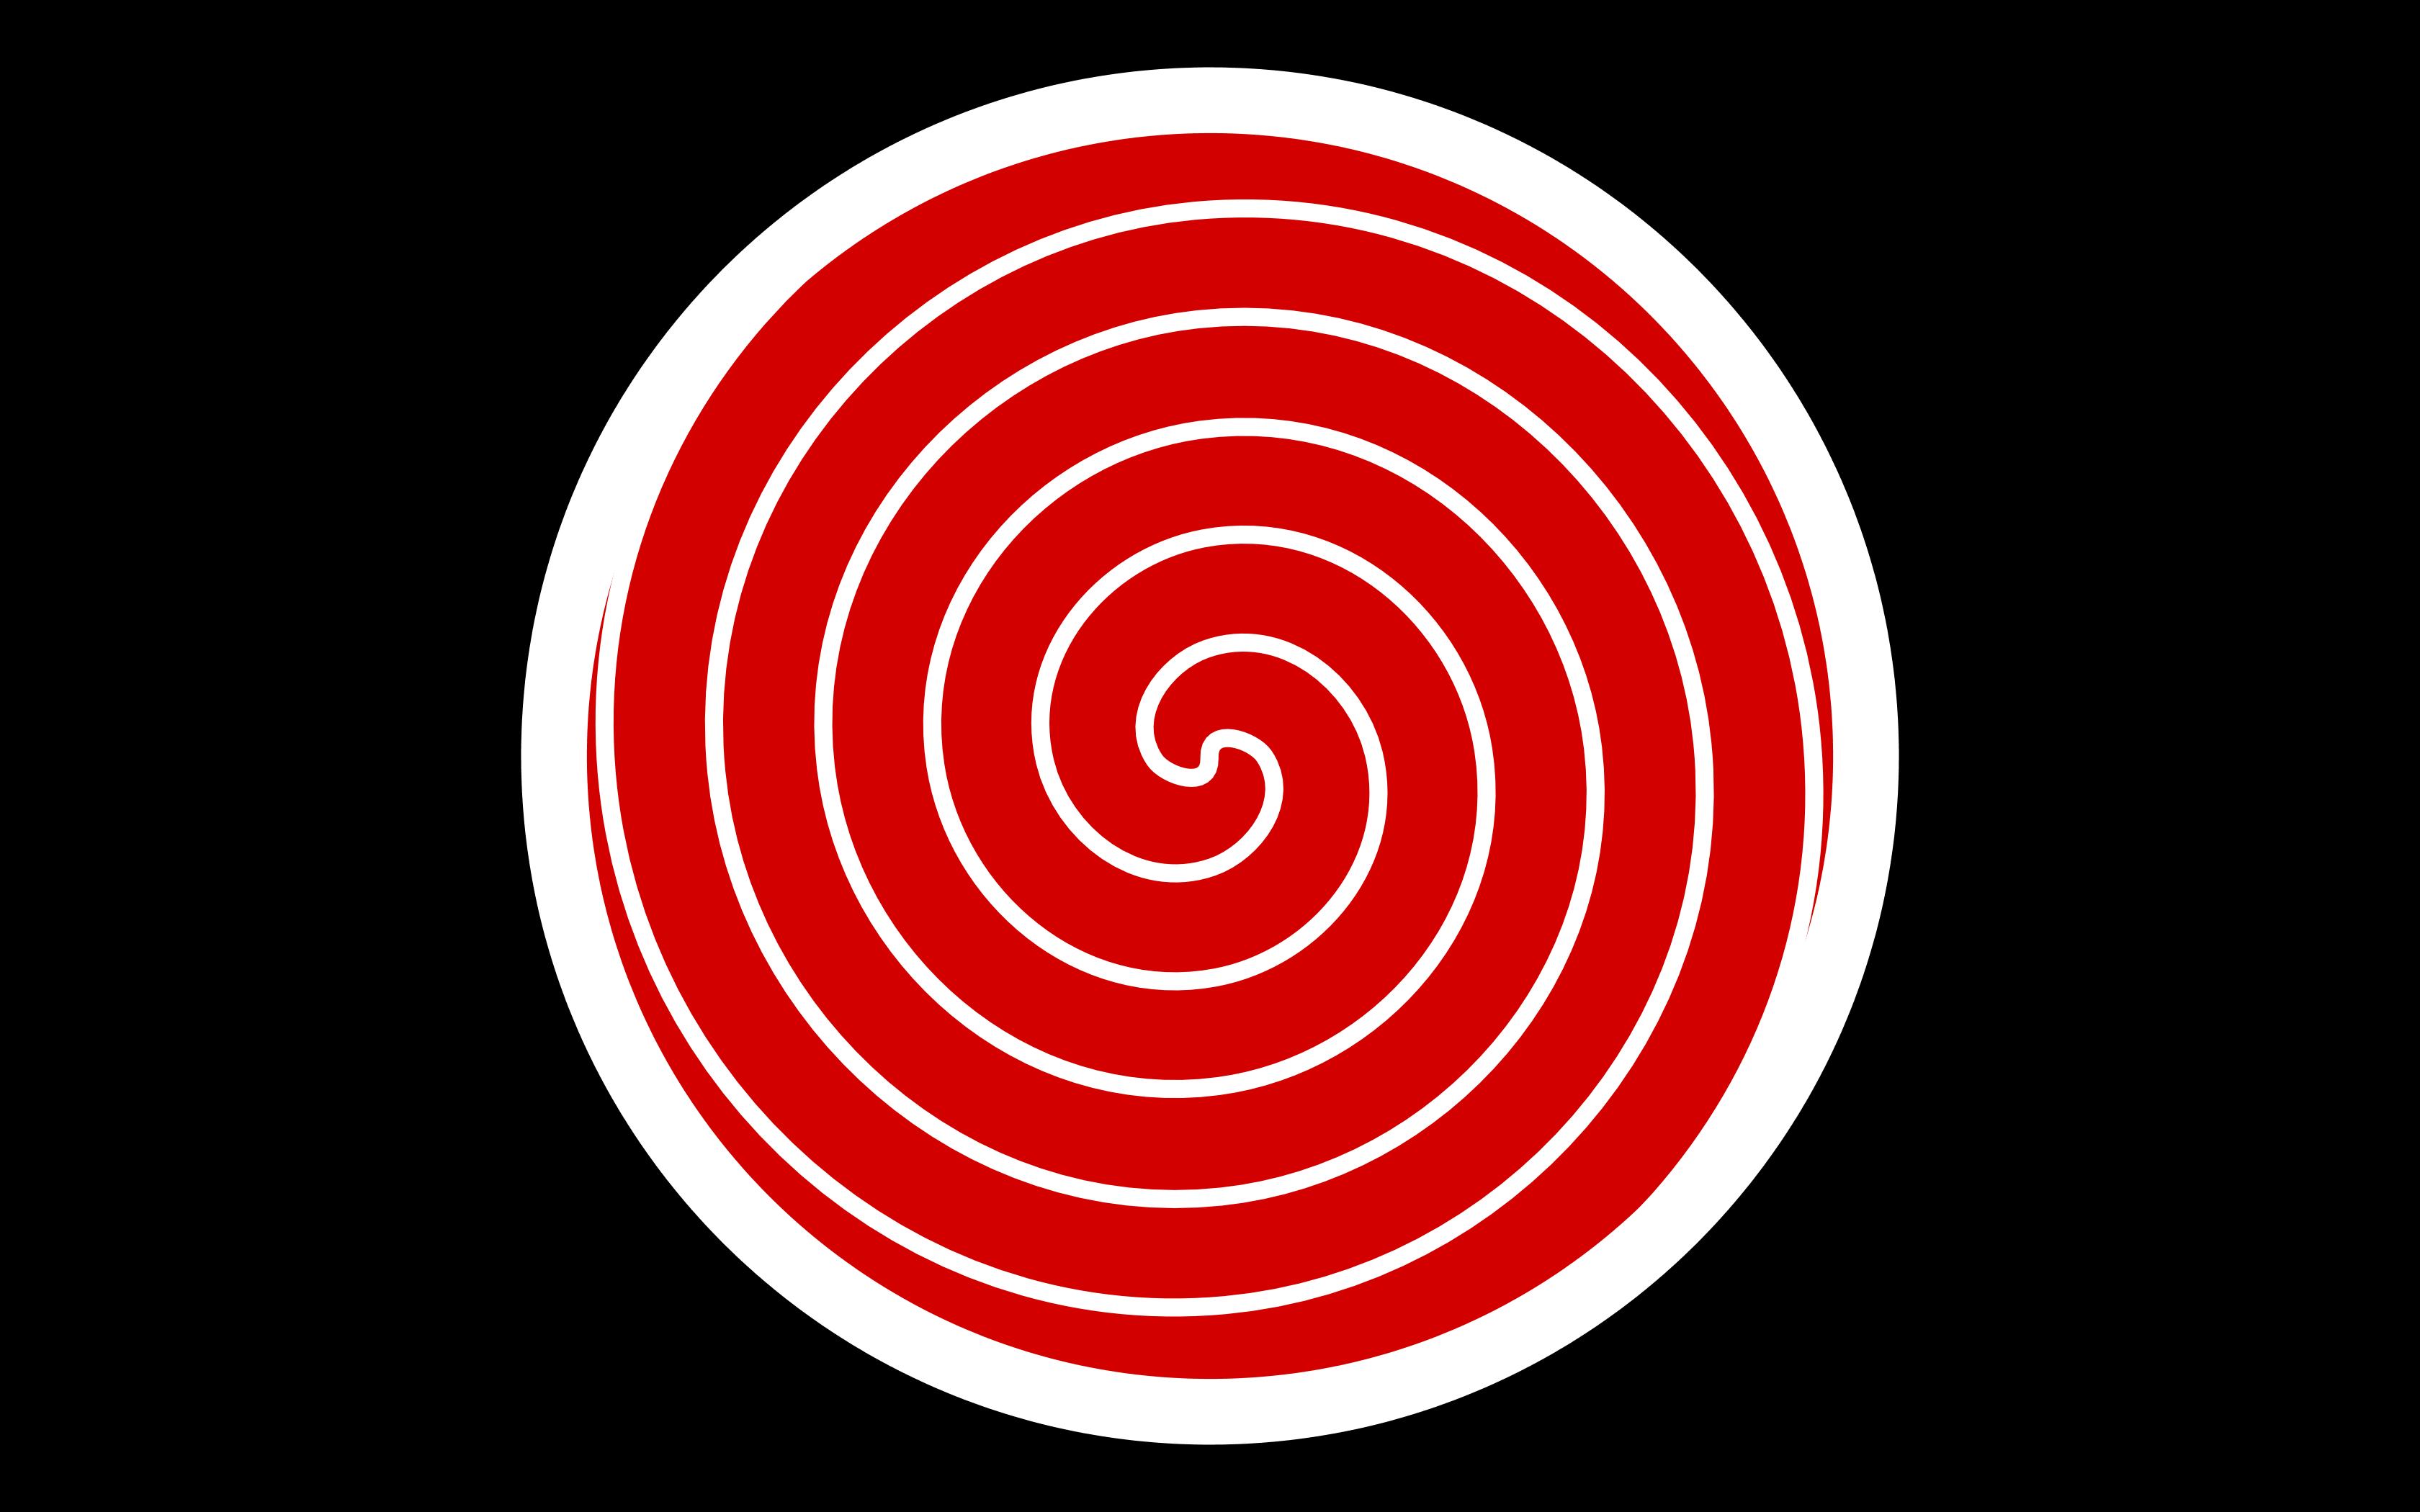 espiral_roja